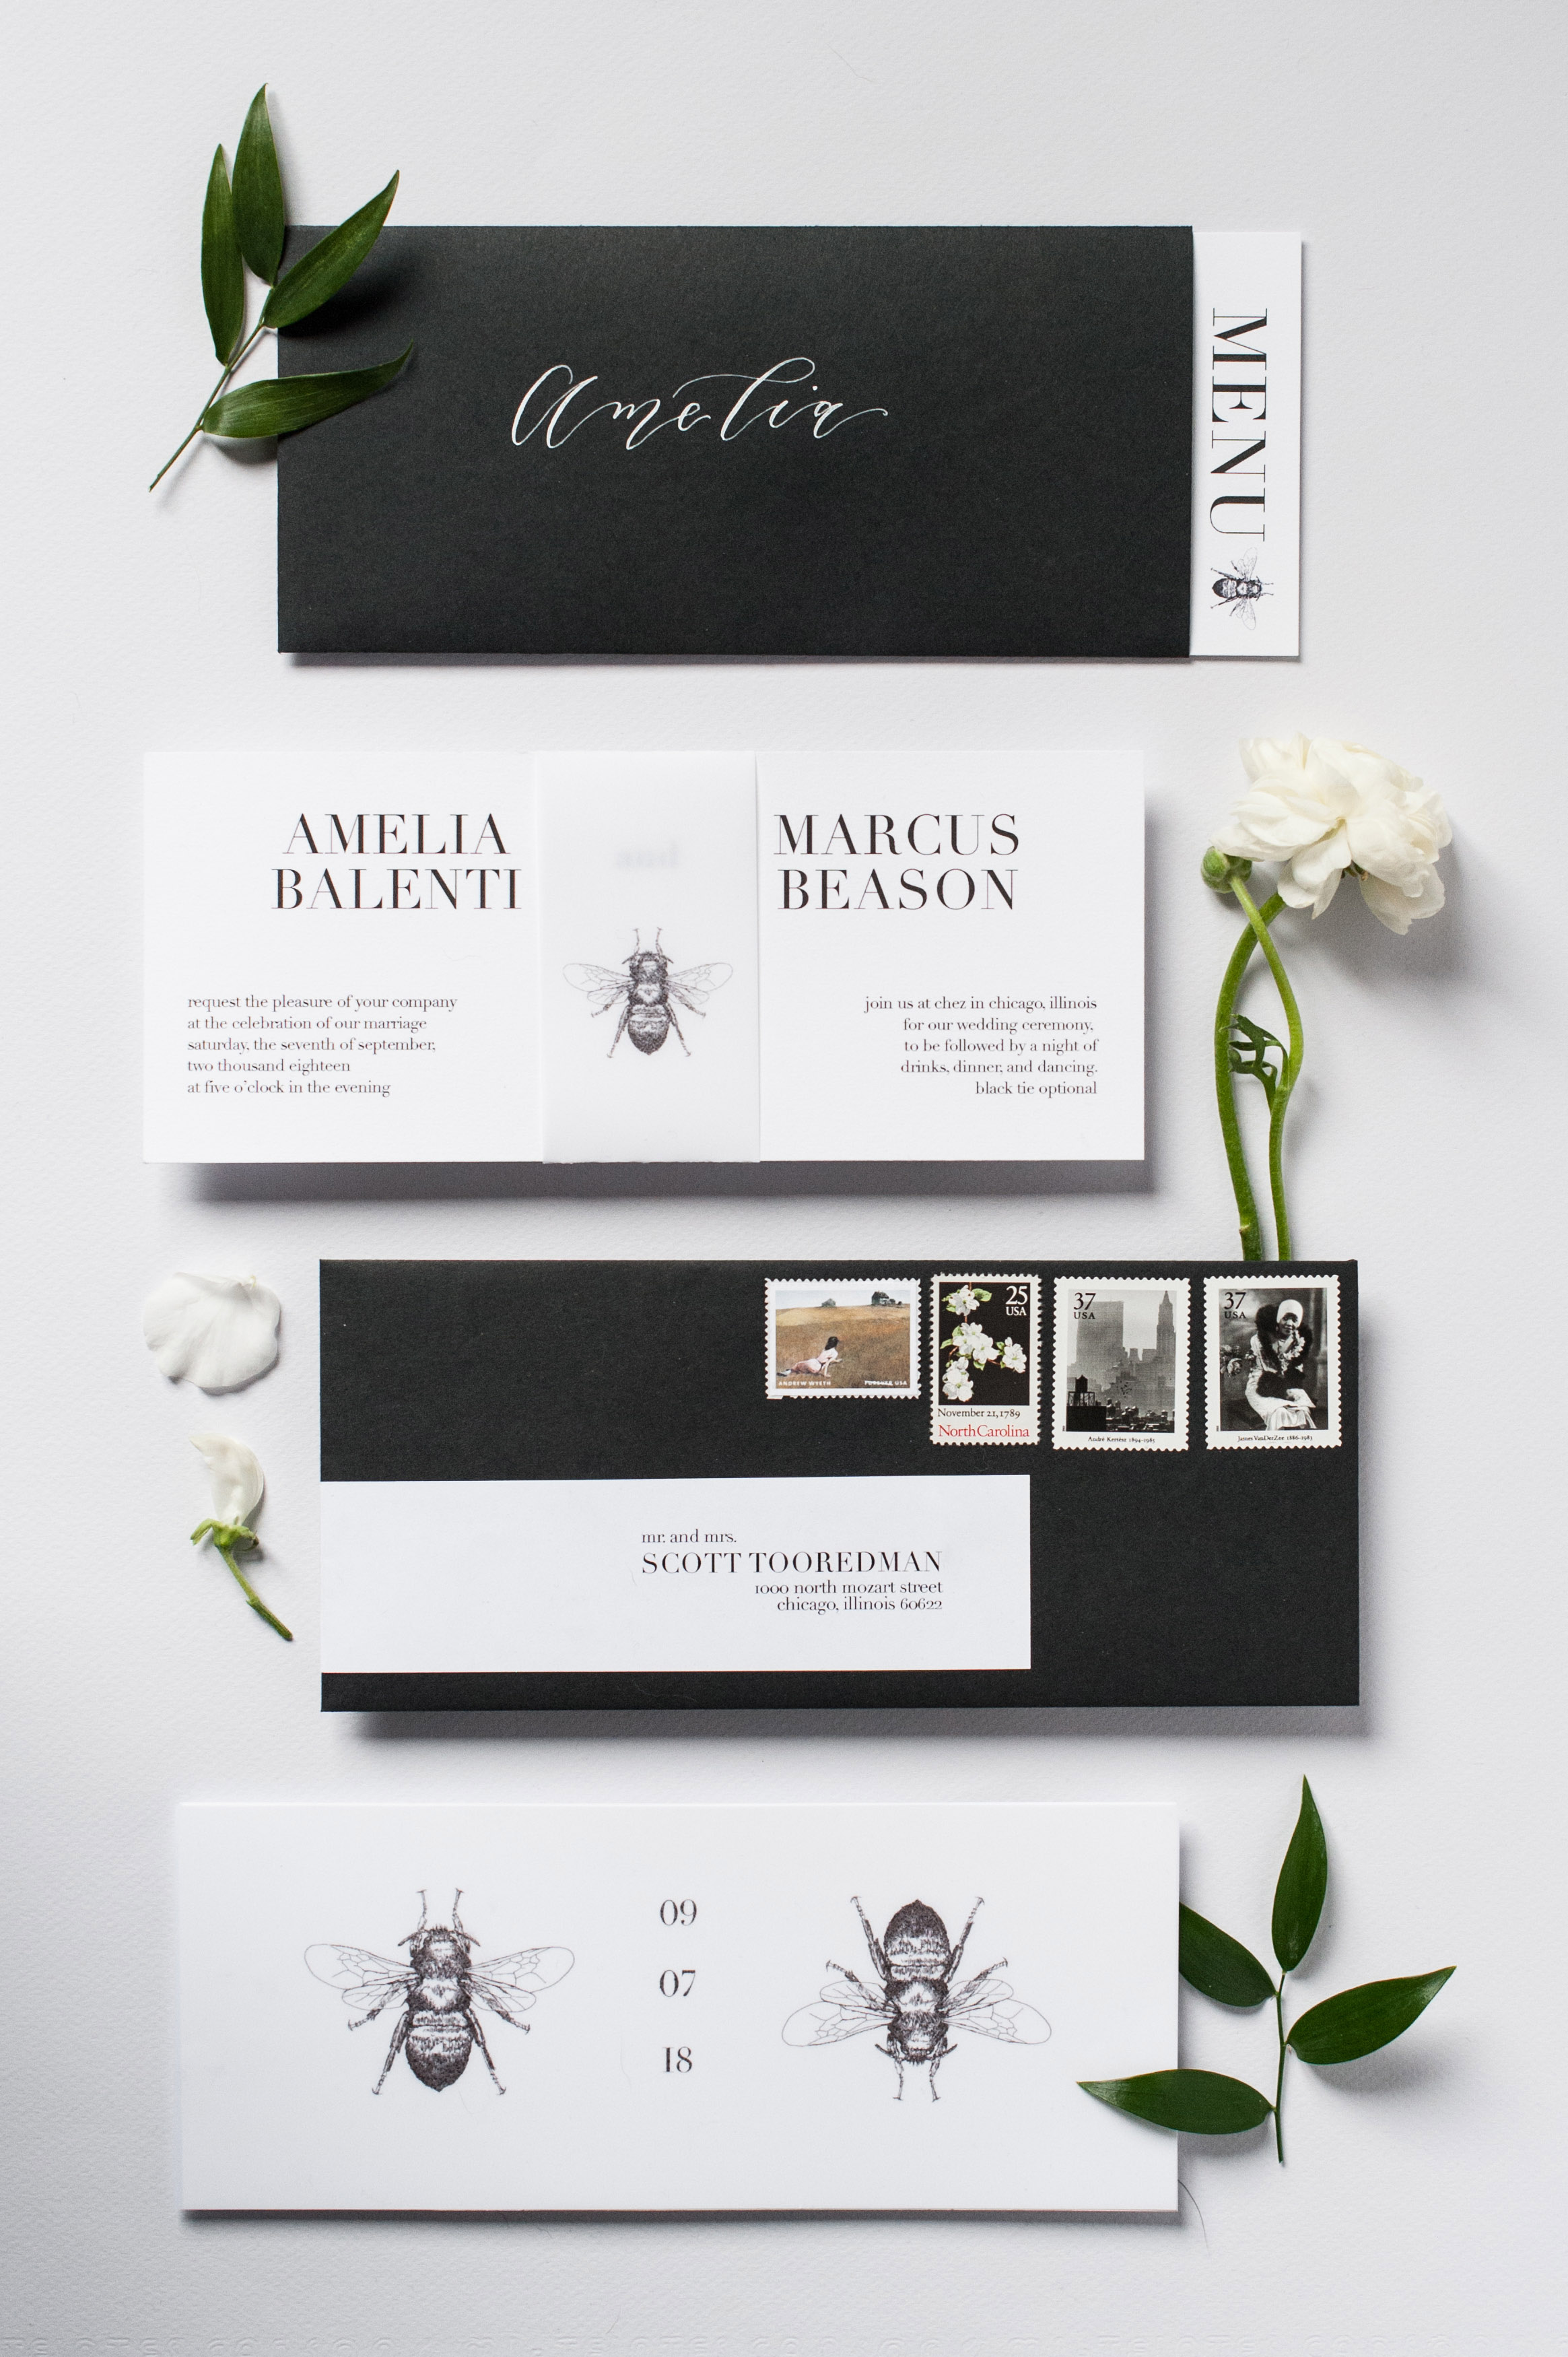 wedding invitation negative space horizontal illustrated bees